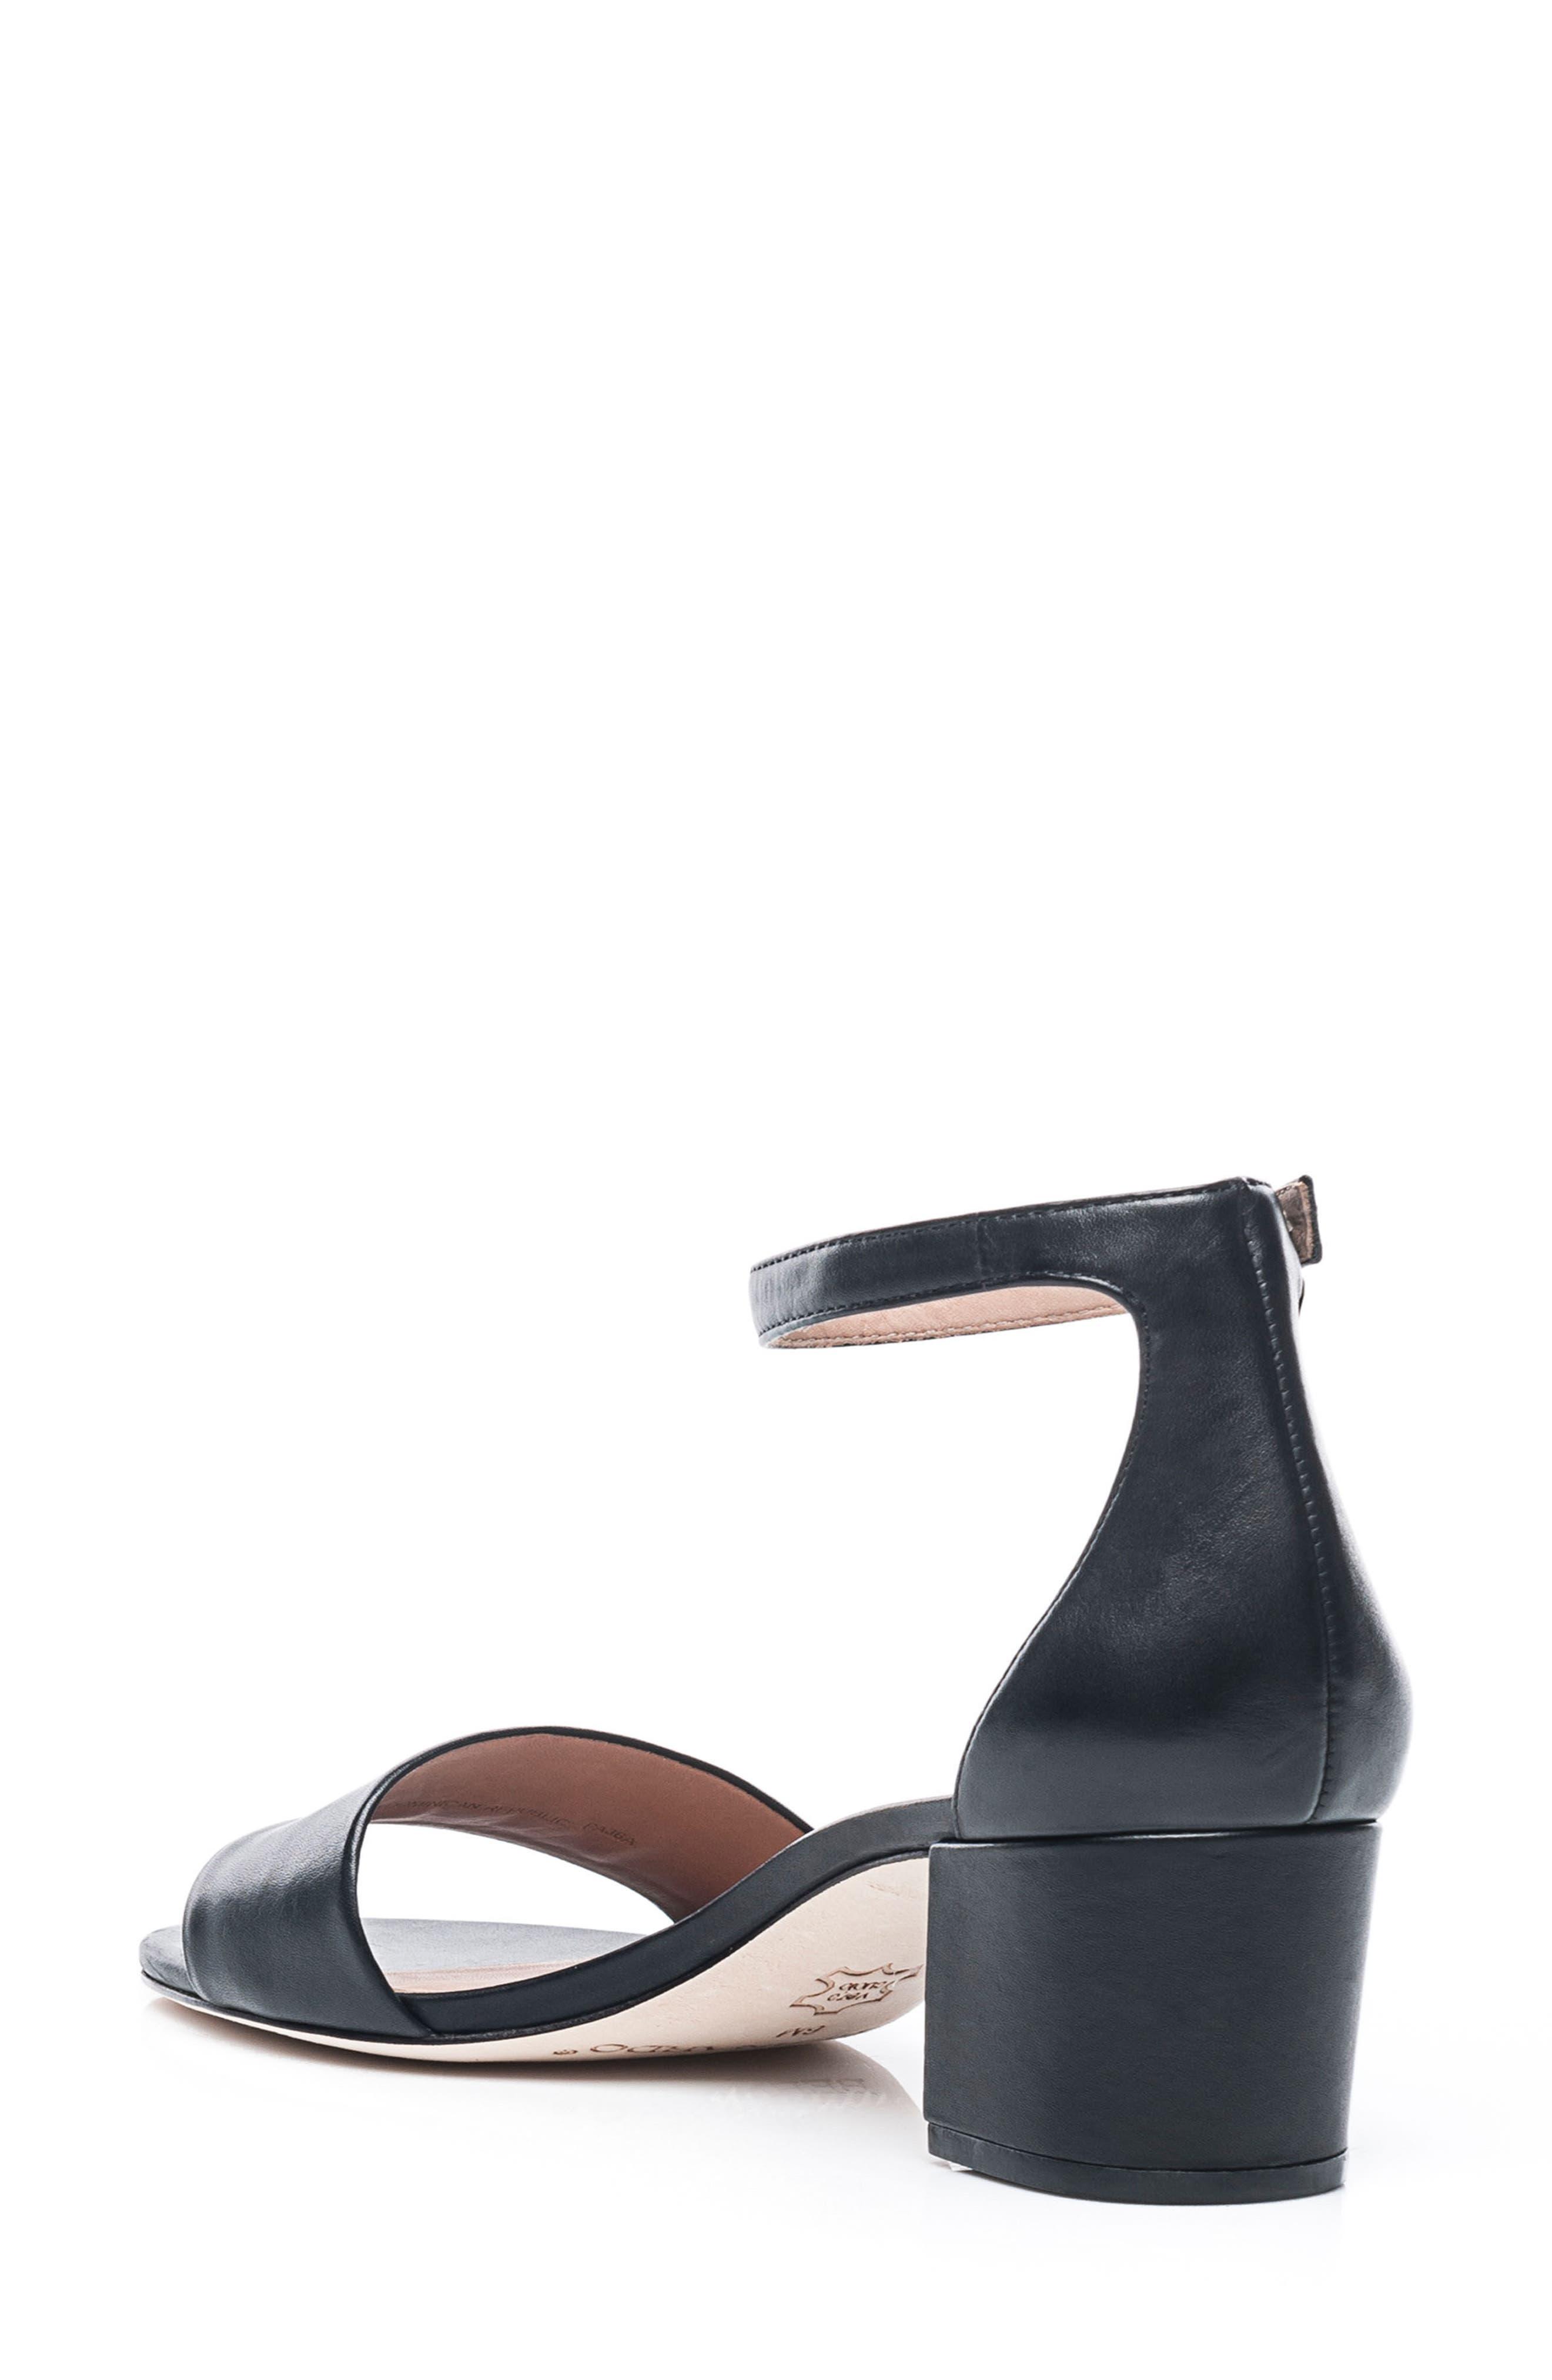 Bernardo Belinda Ankle Strap Sandal,                             Alternate thumbnail 2, color,                             BLACK LEATHER